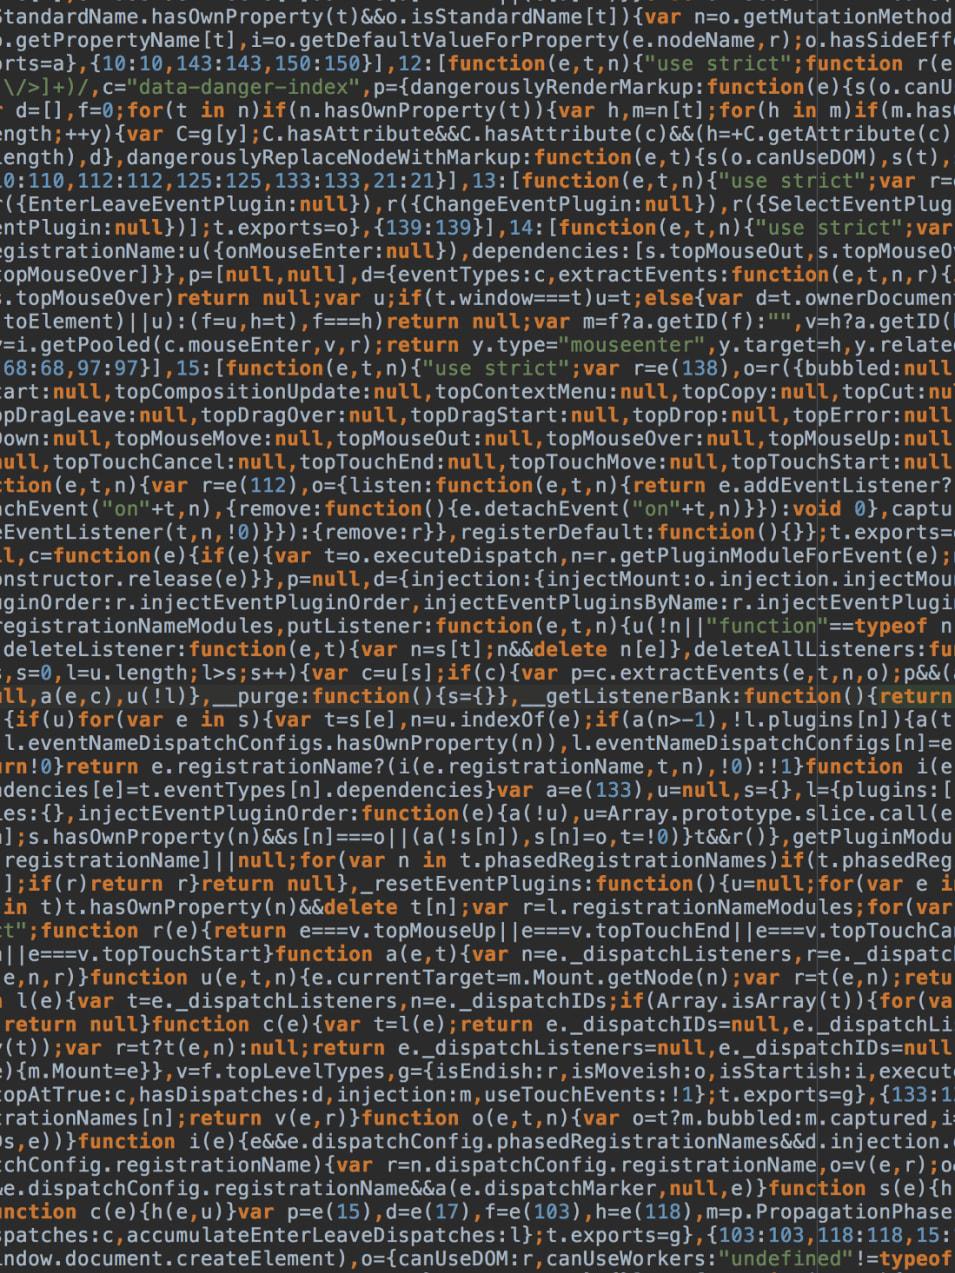 React.js 0.13.3 minified